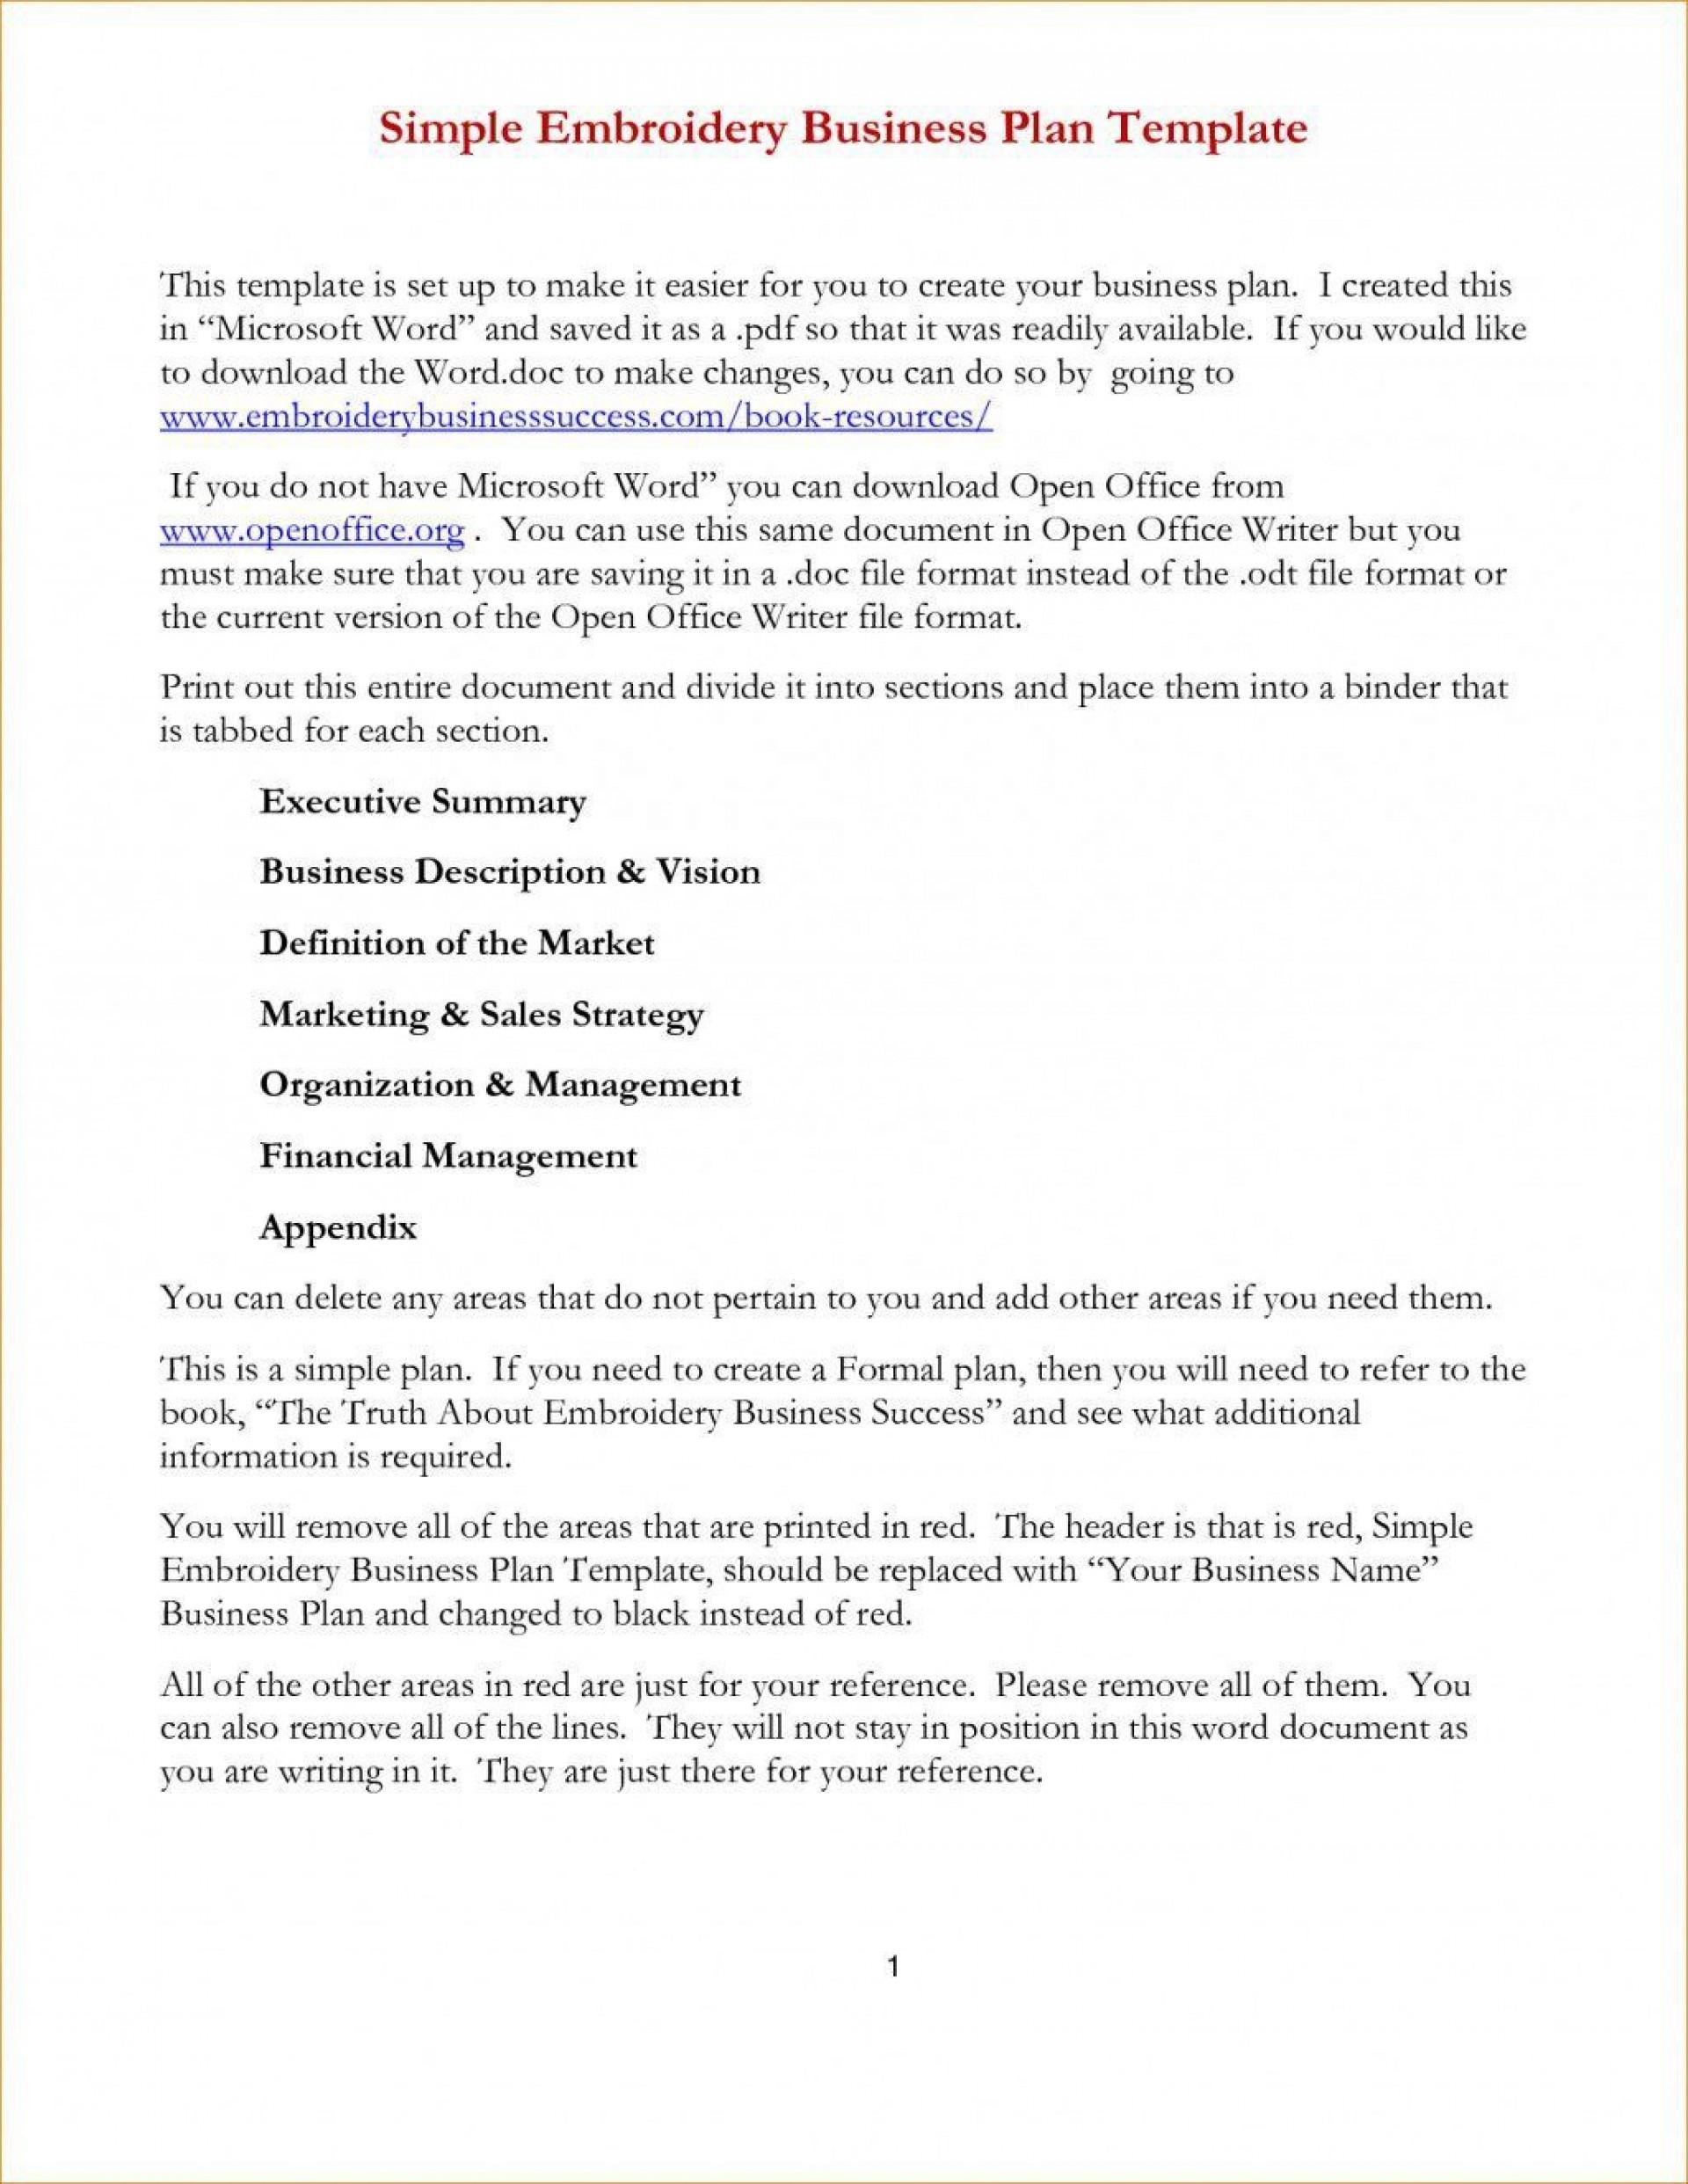 Microsoft Word Business Plan Template Addictionary